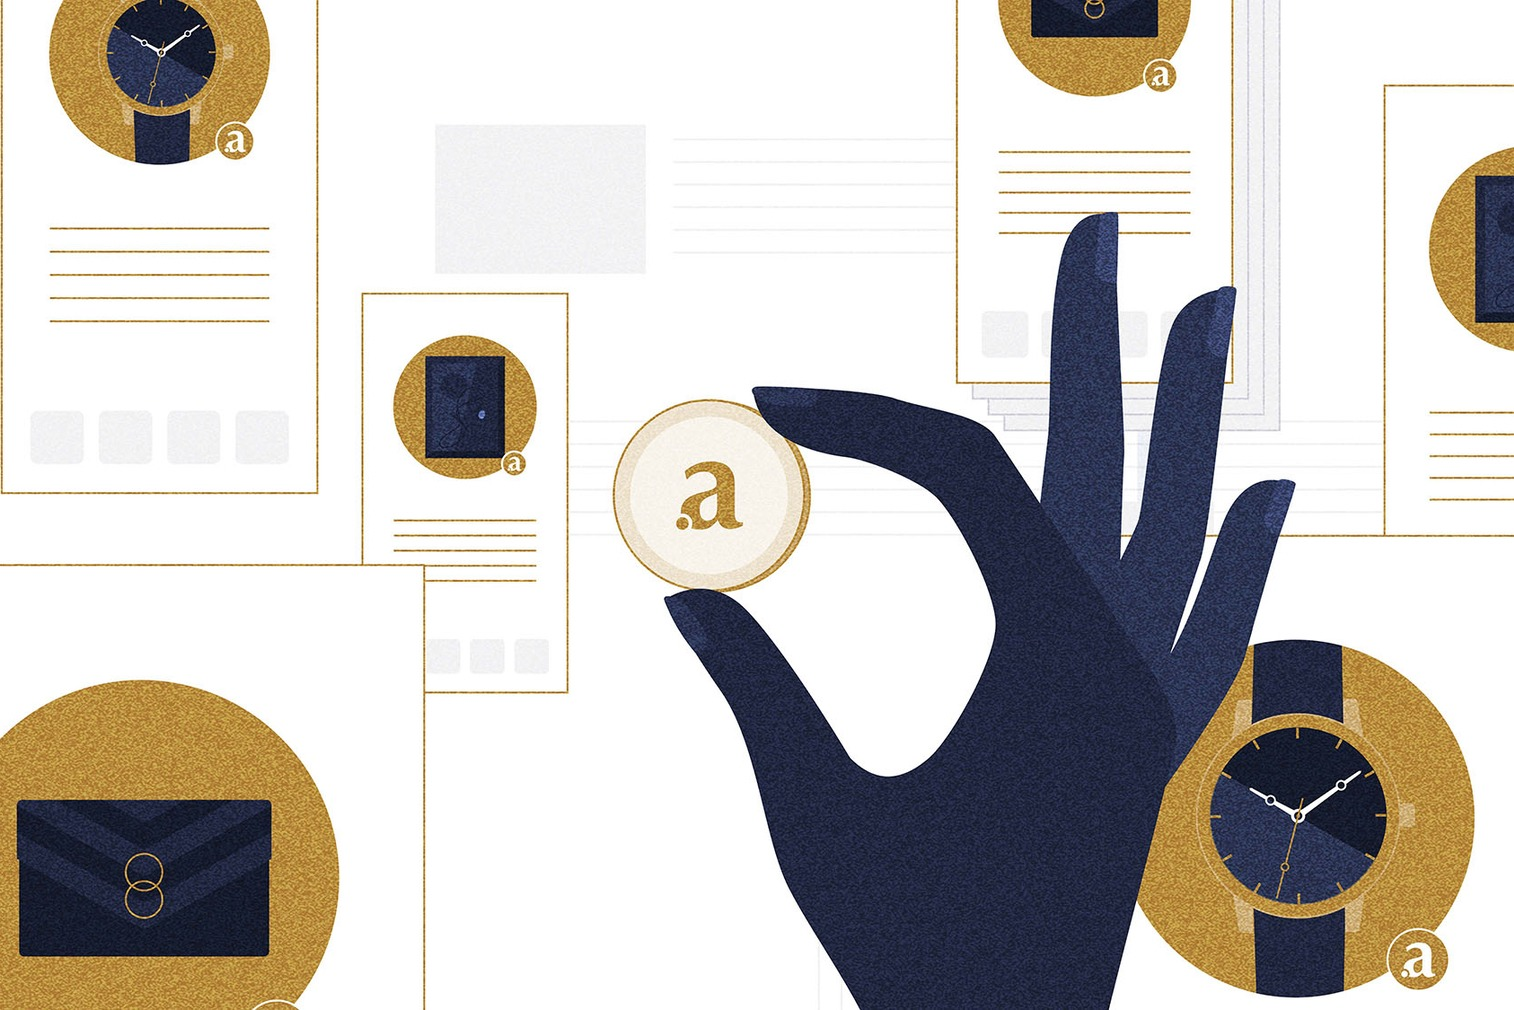 arianee-blockchain-2019